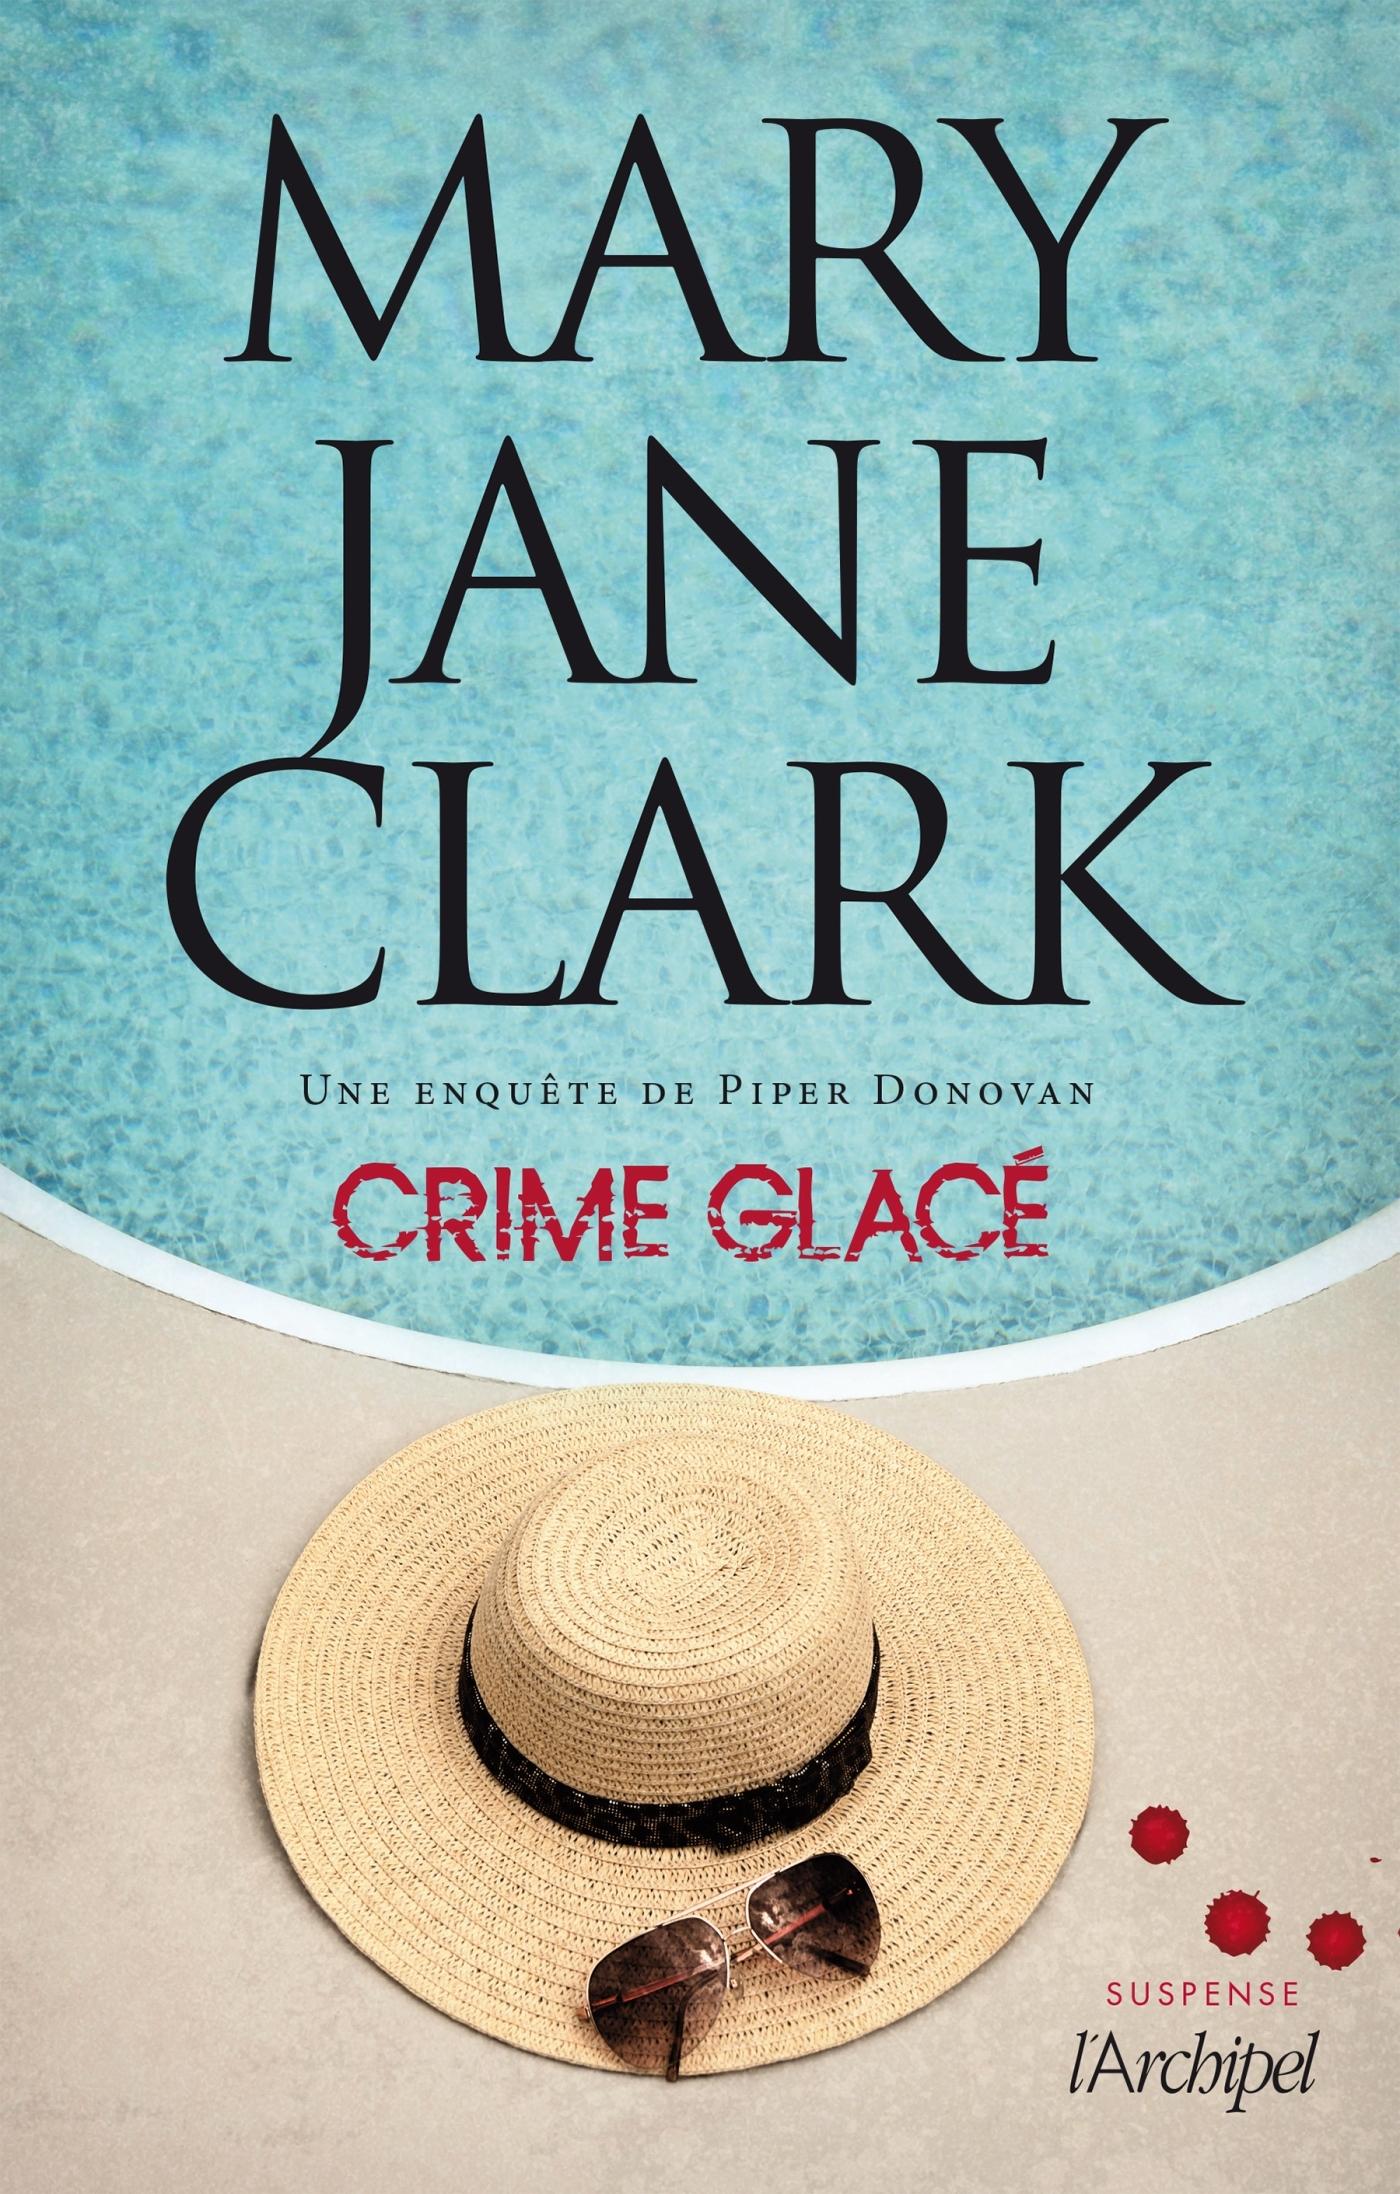 CRIME GLACE